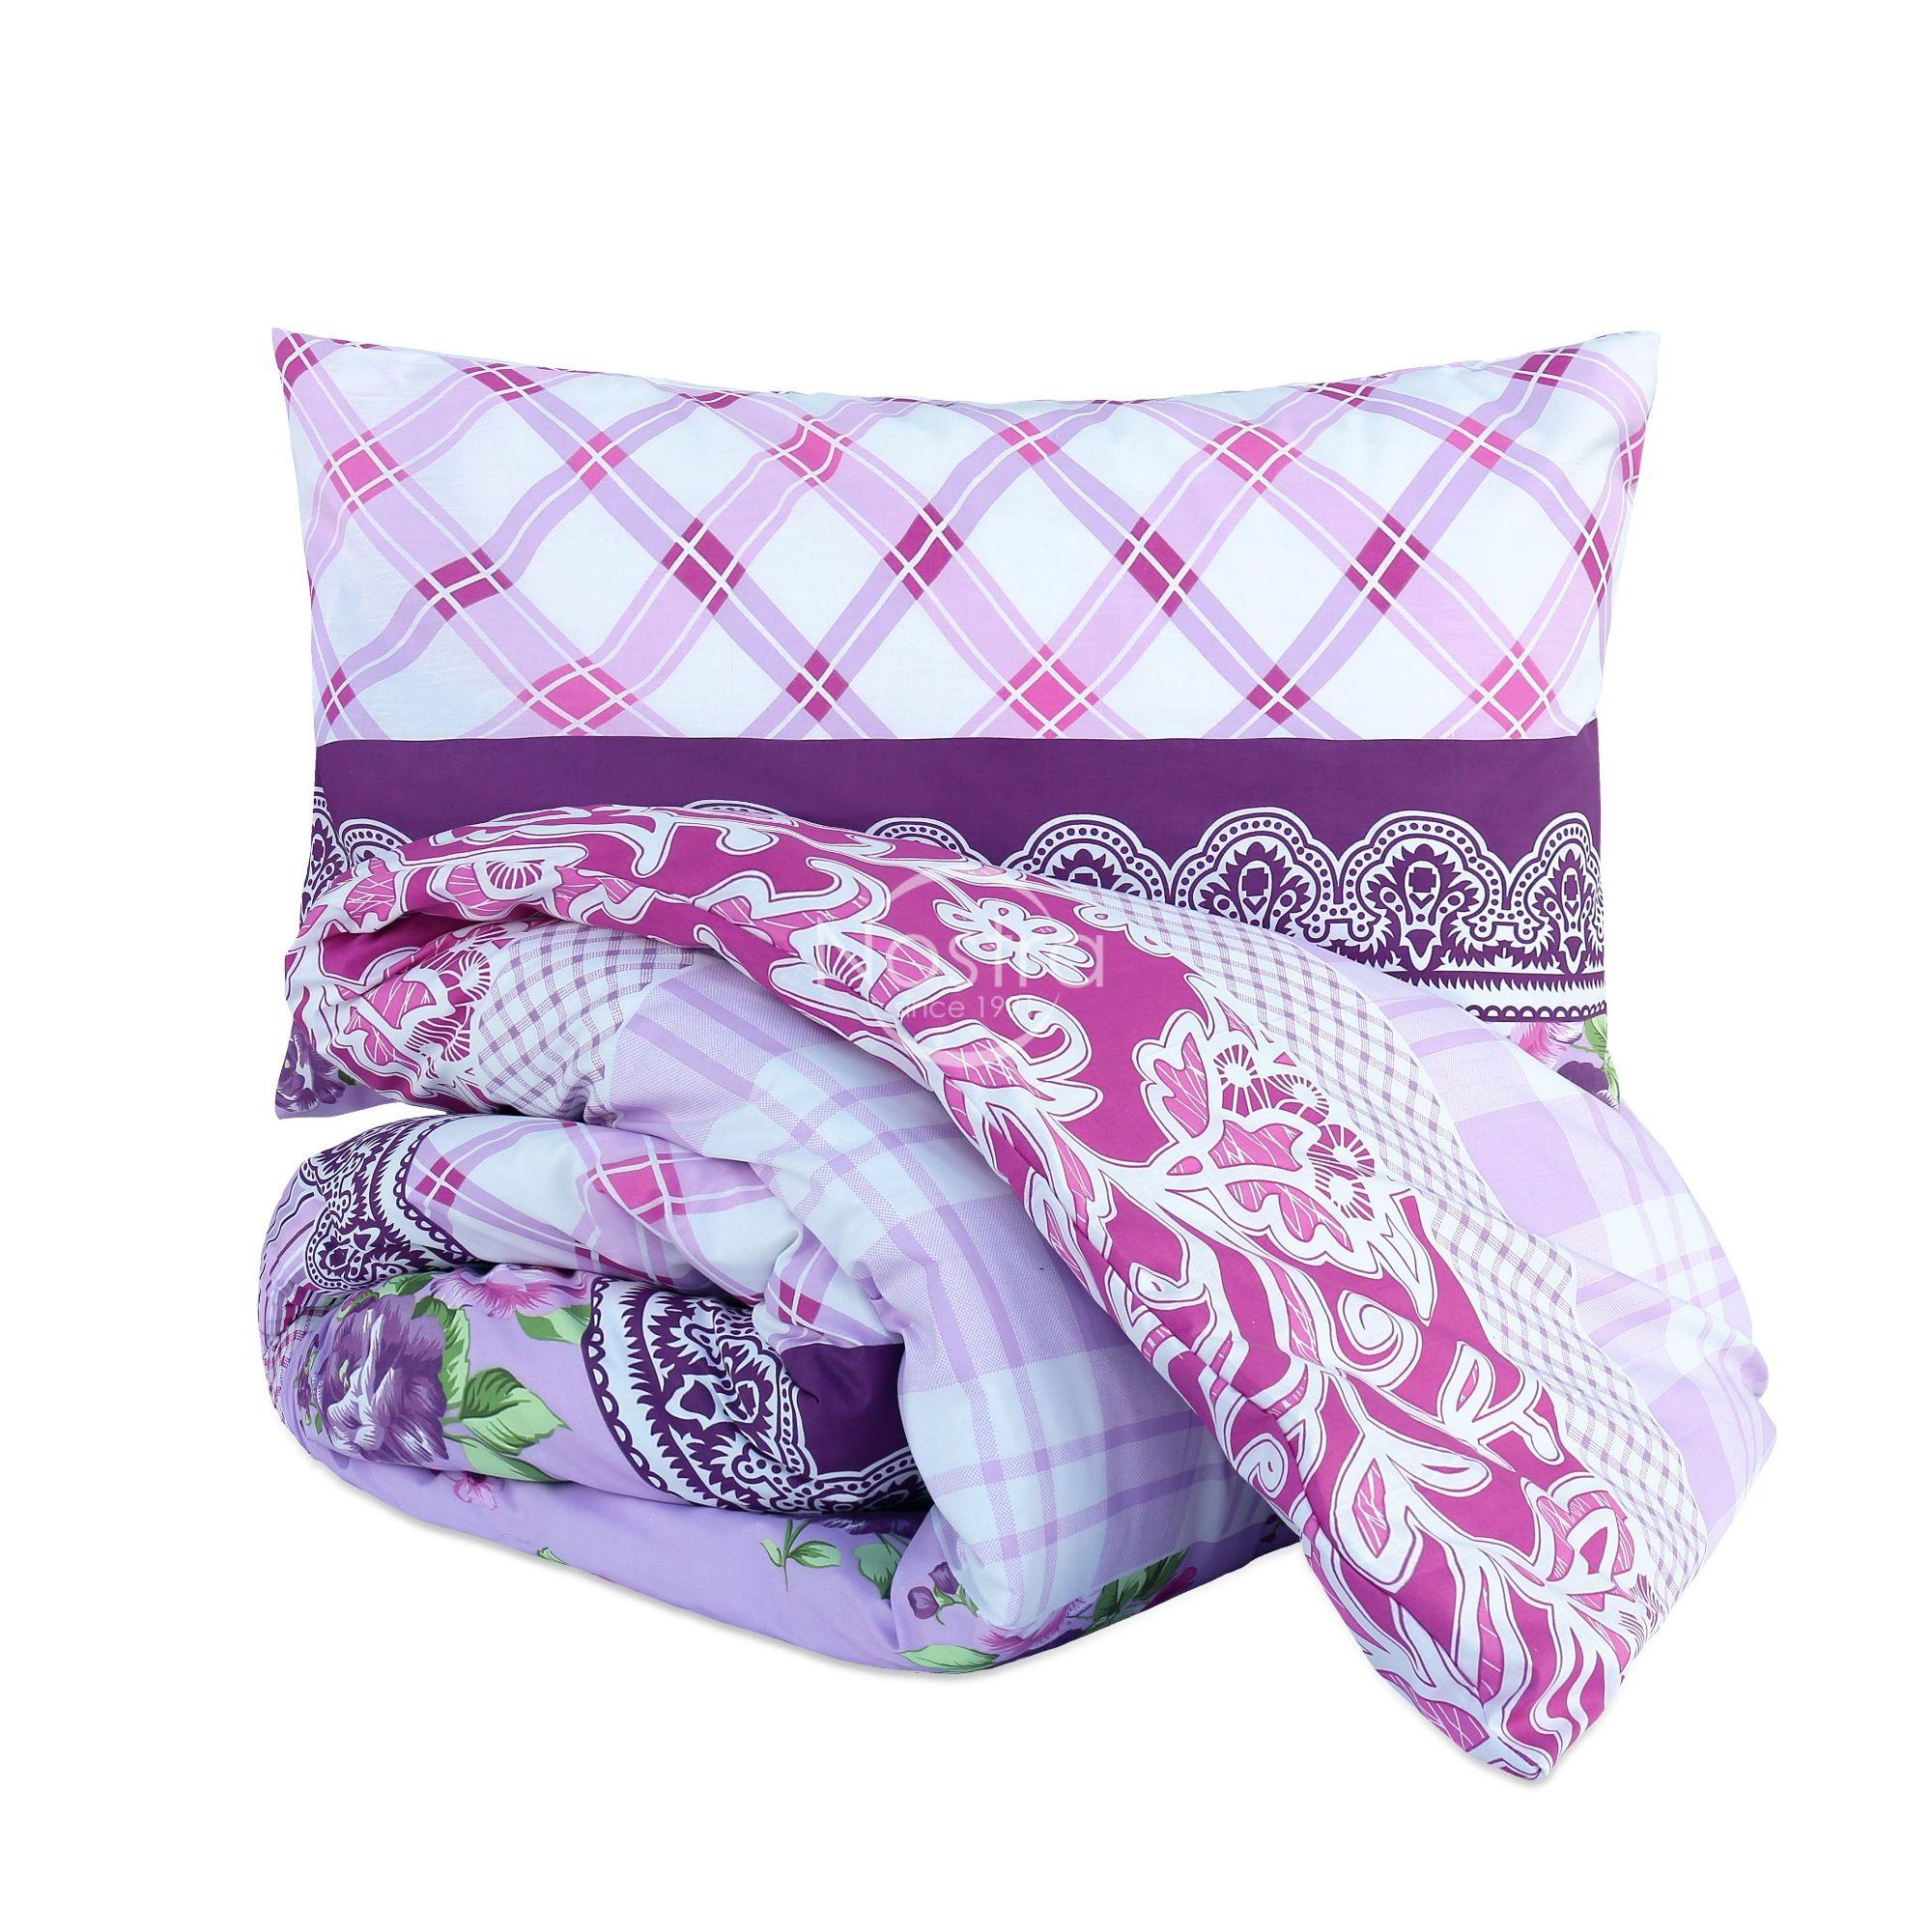 Polycotton bedding set HADLEY